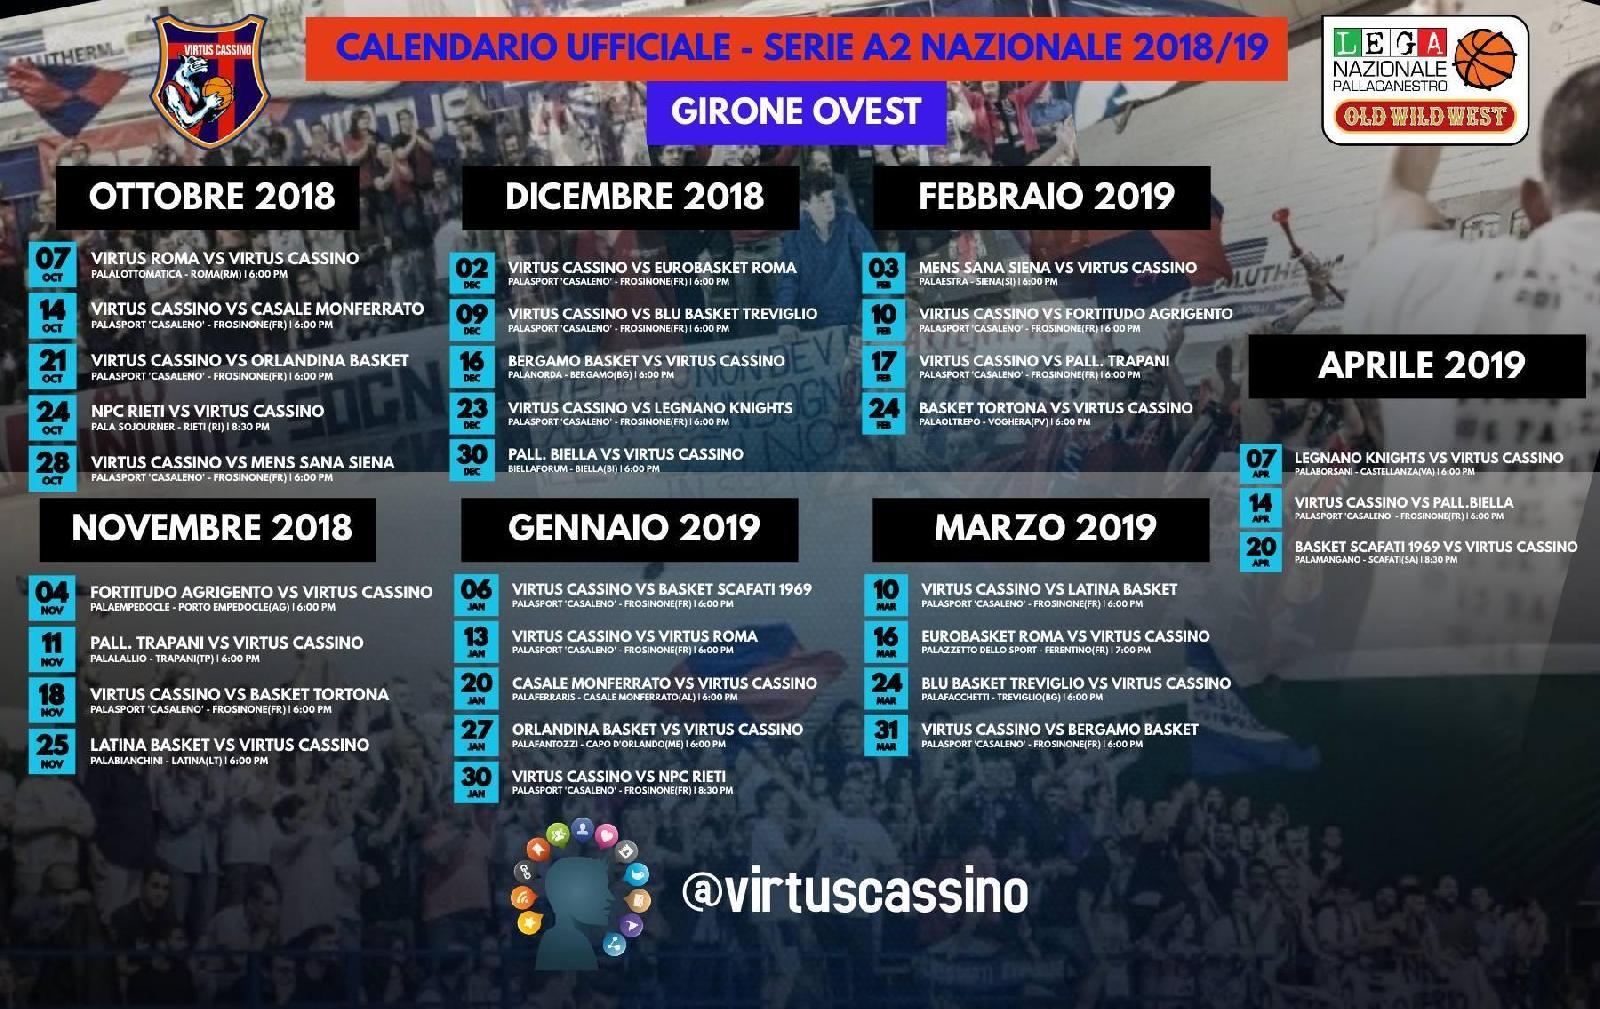 Virtus Roma Calendario.Virtus Cassino Esordio Al Palalottomatica Di Roma